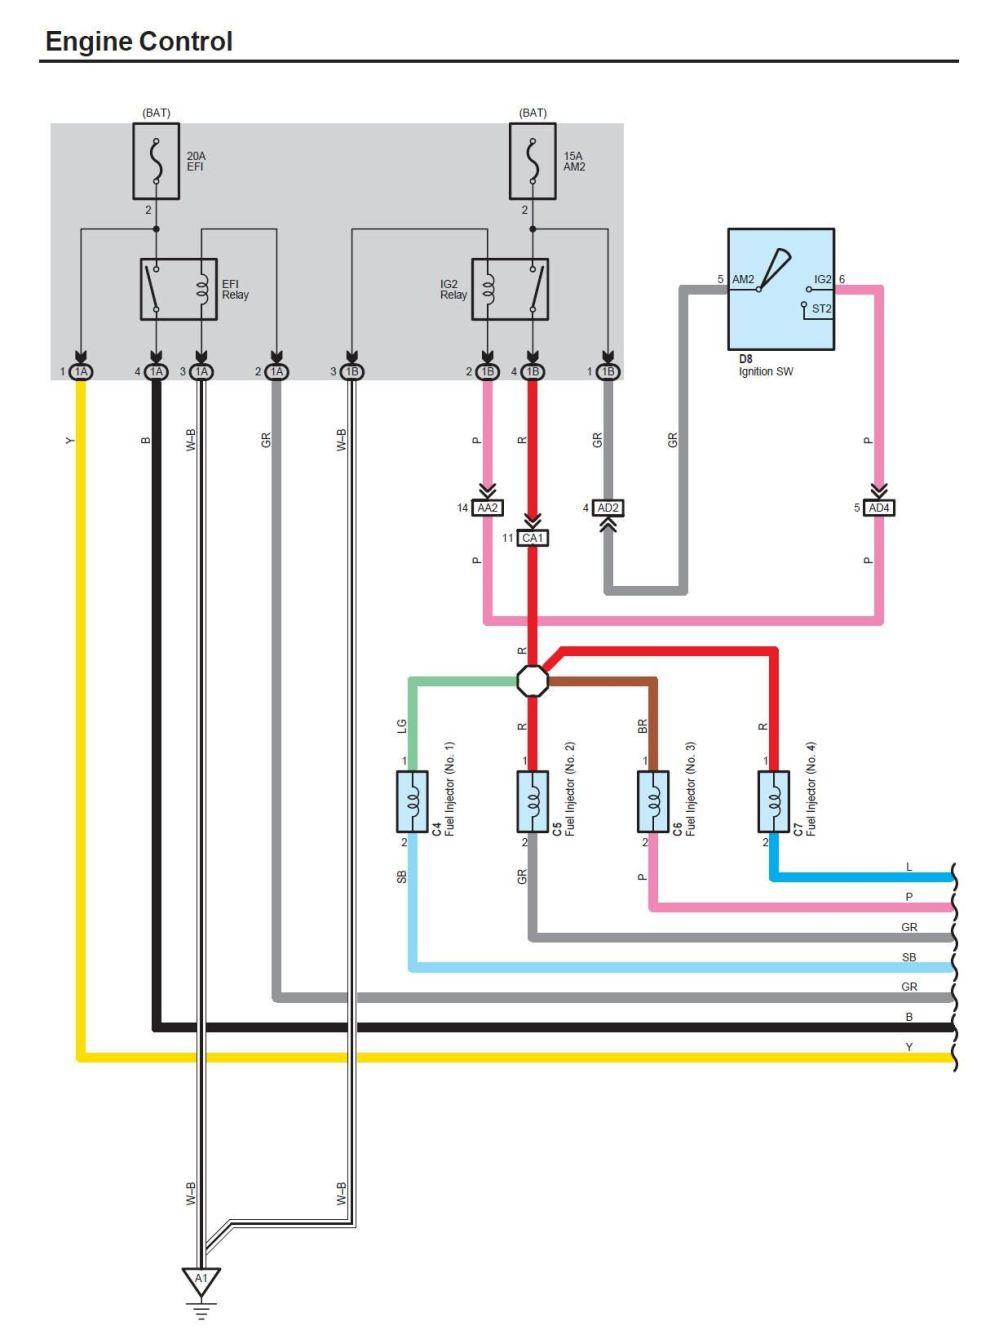 medium resolution of 2007 toyota yaris engine wiring diagram my car parts toyota 22r ignition wiring diagram 89 toyota hilux ignition wiring diagram